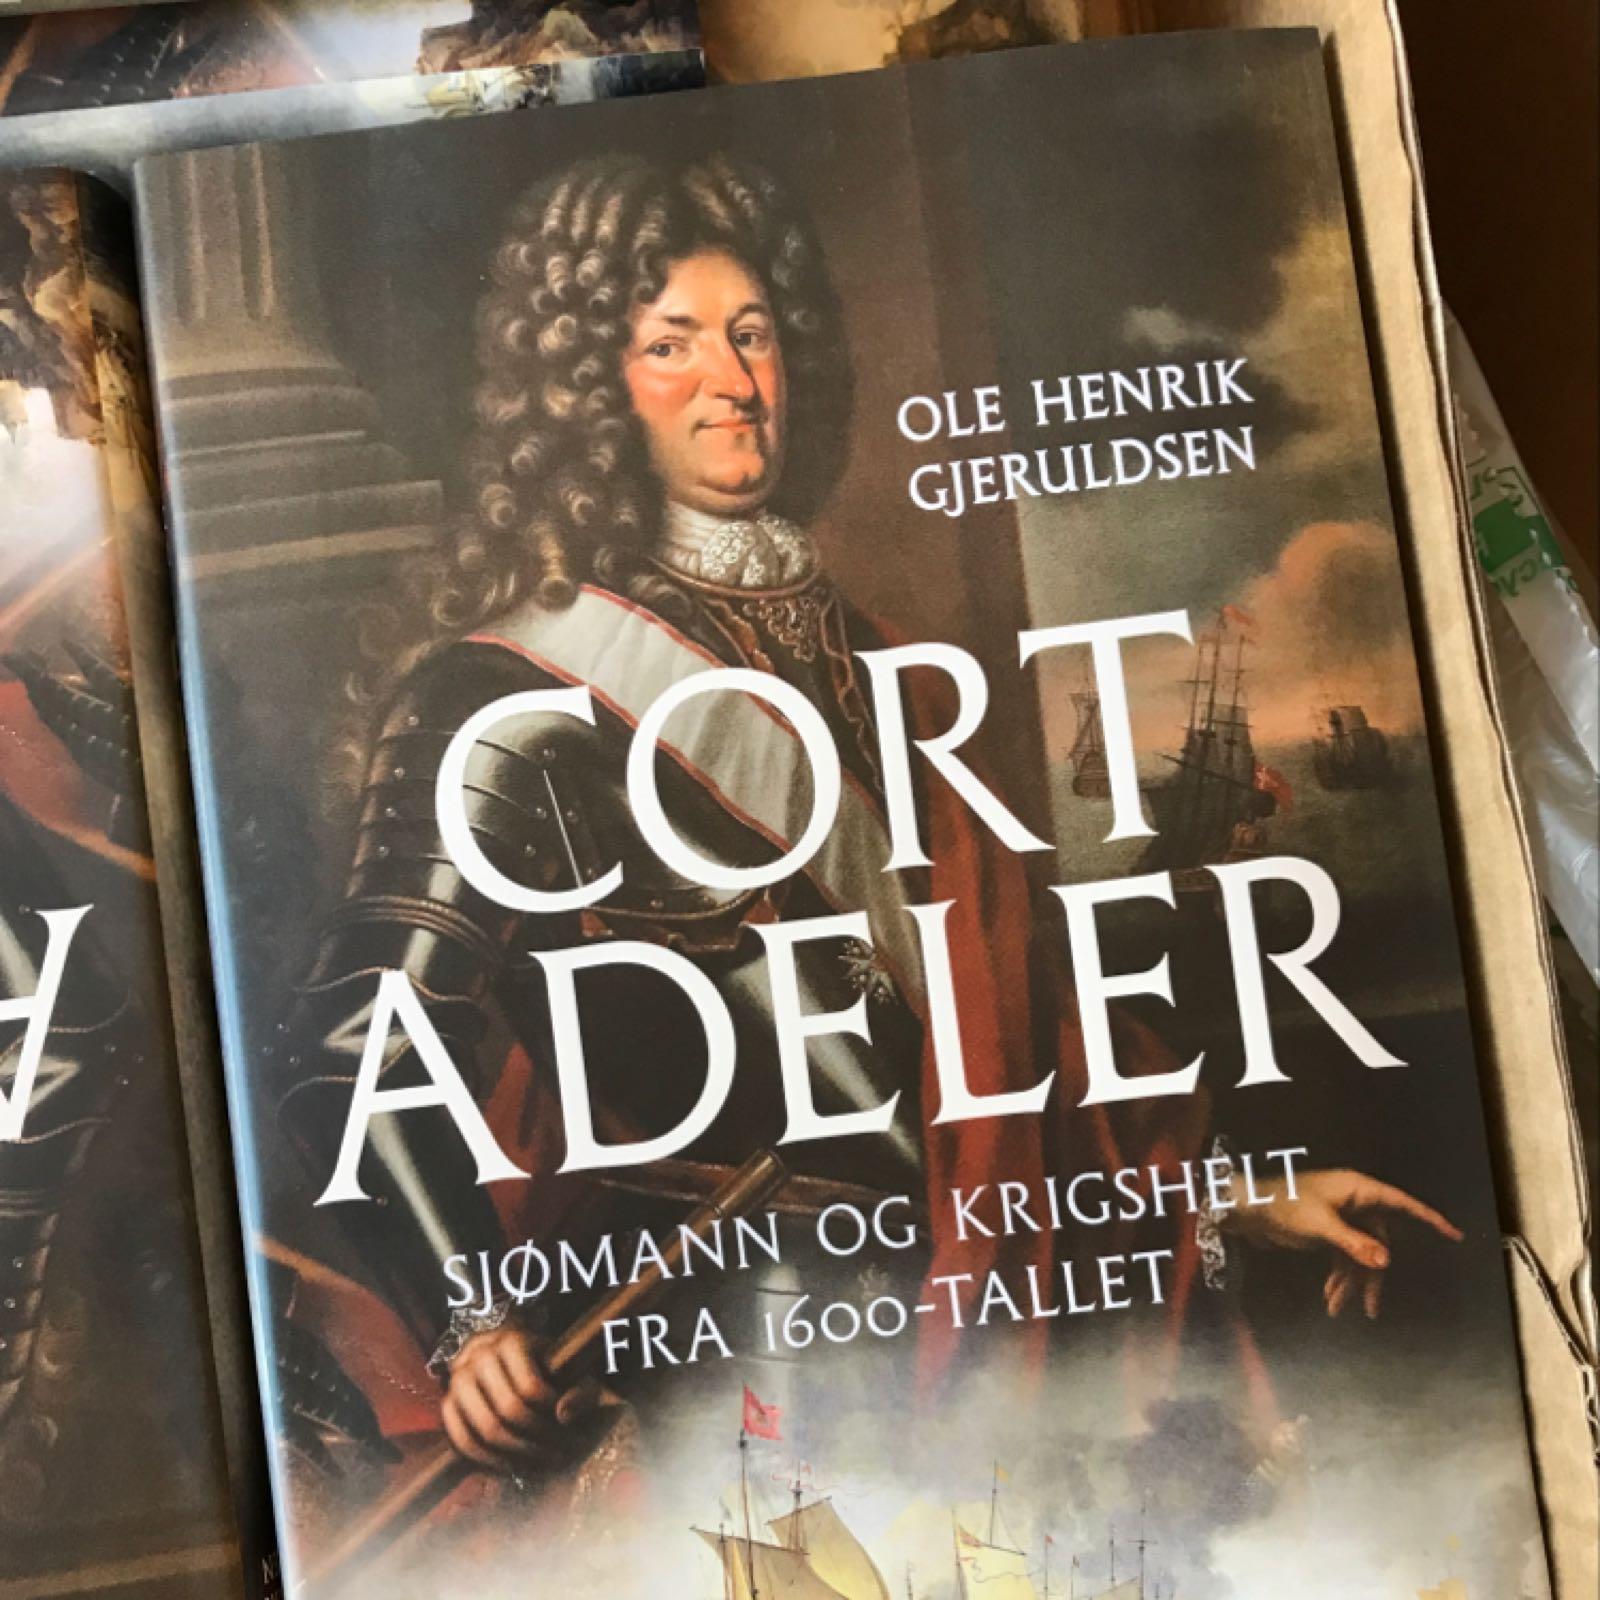 Cort Adeler biografi